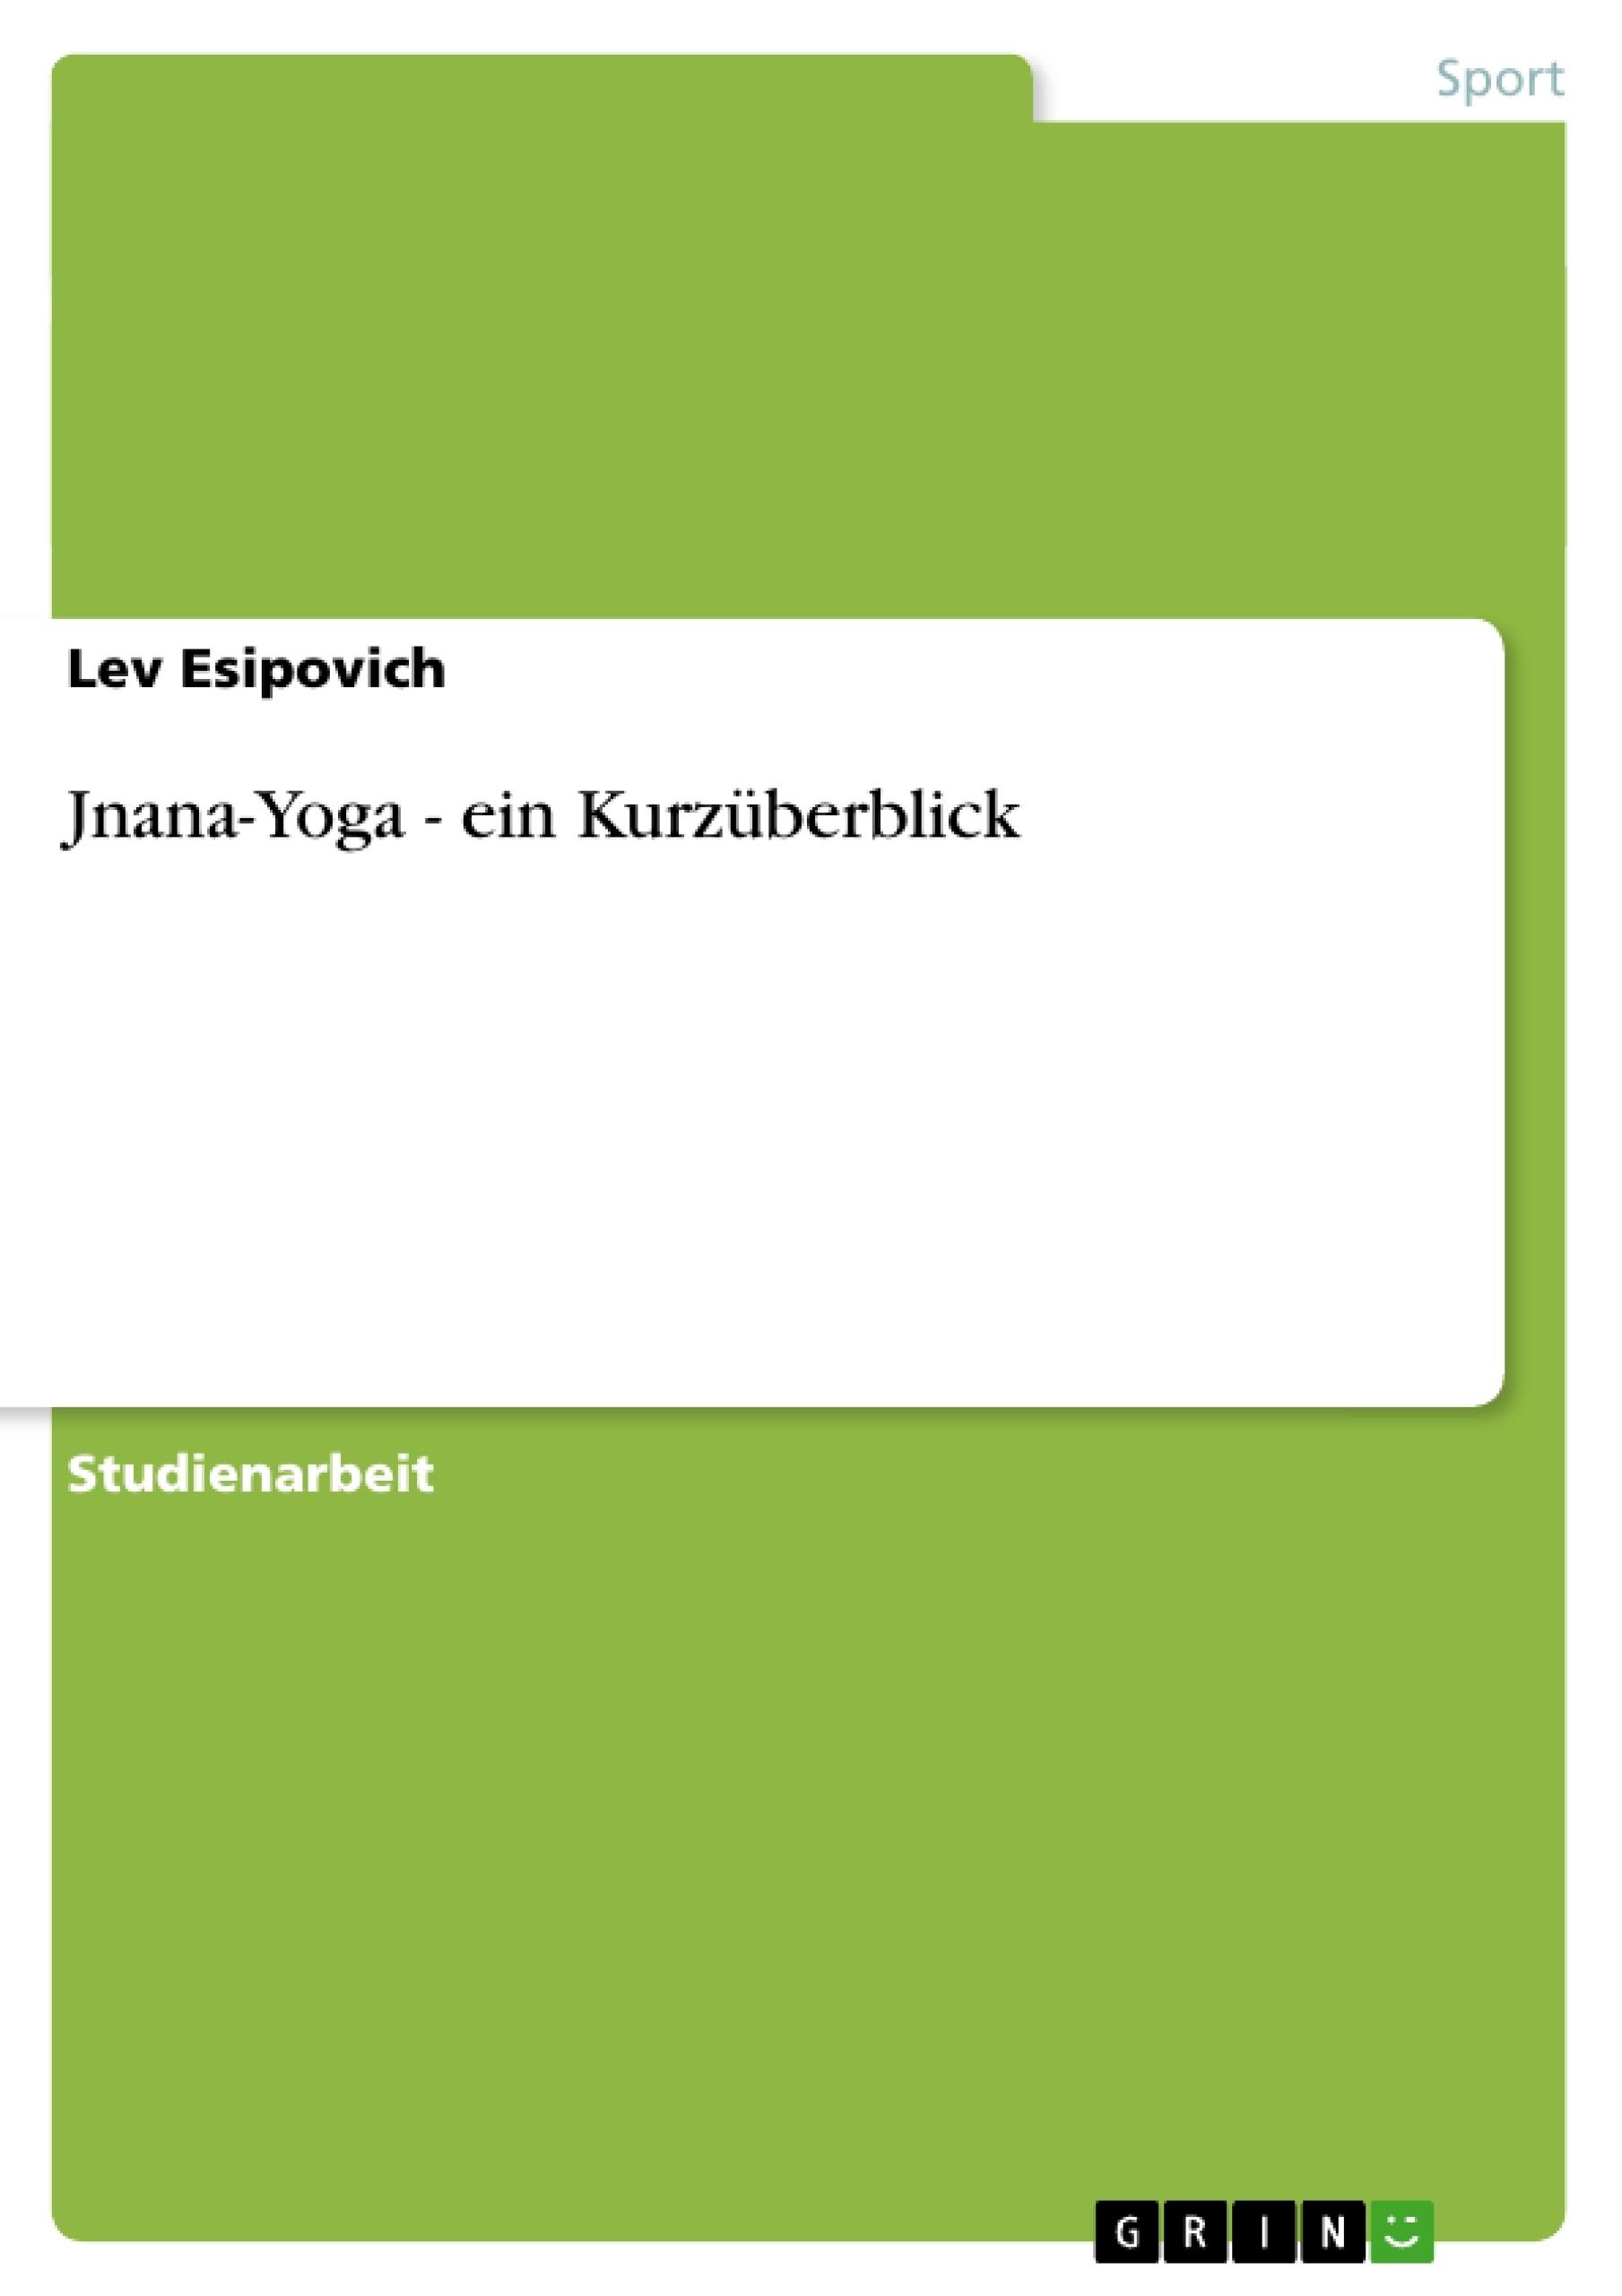 Titel: Jnana-Yoga - ein Kurzüberblick